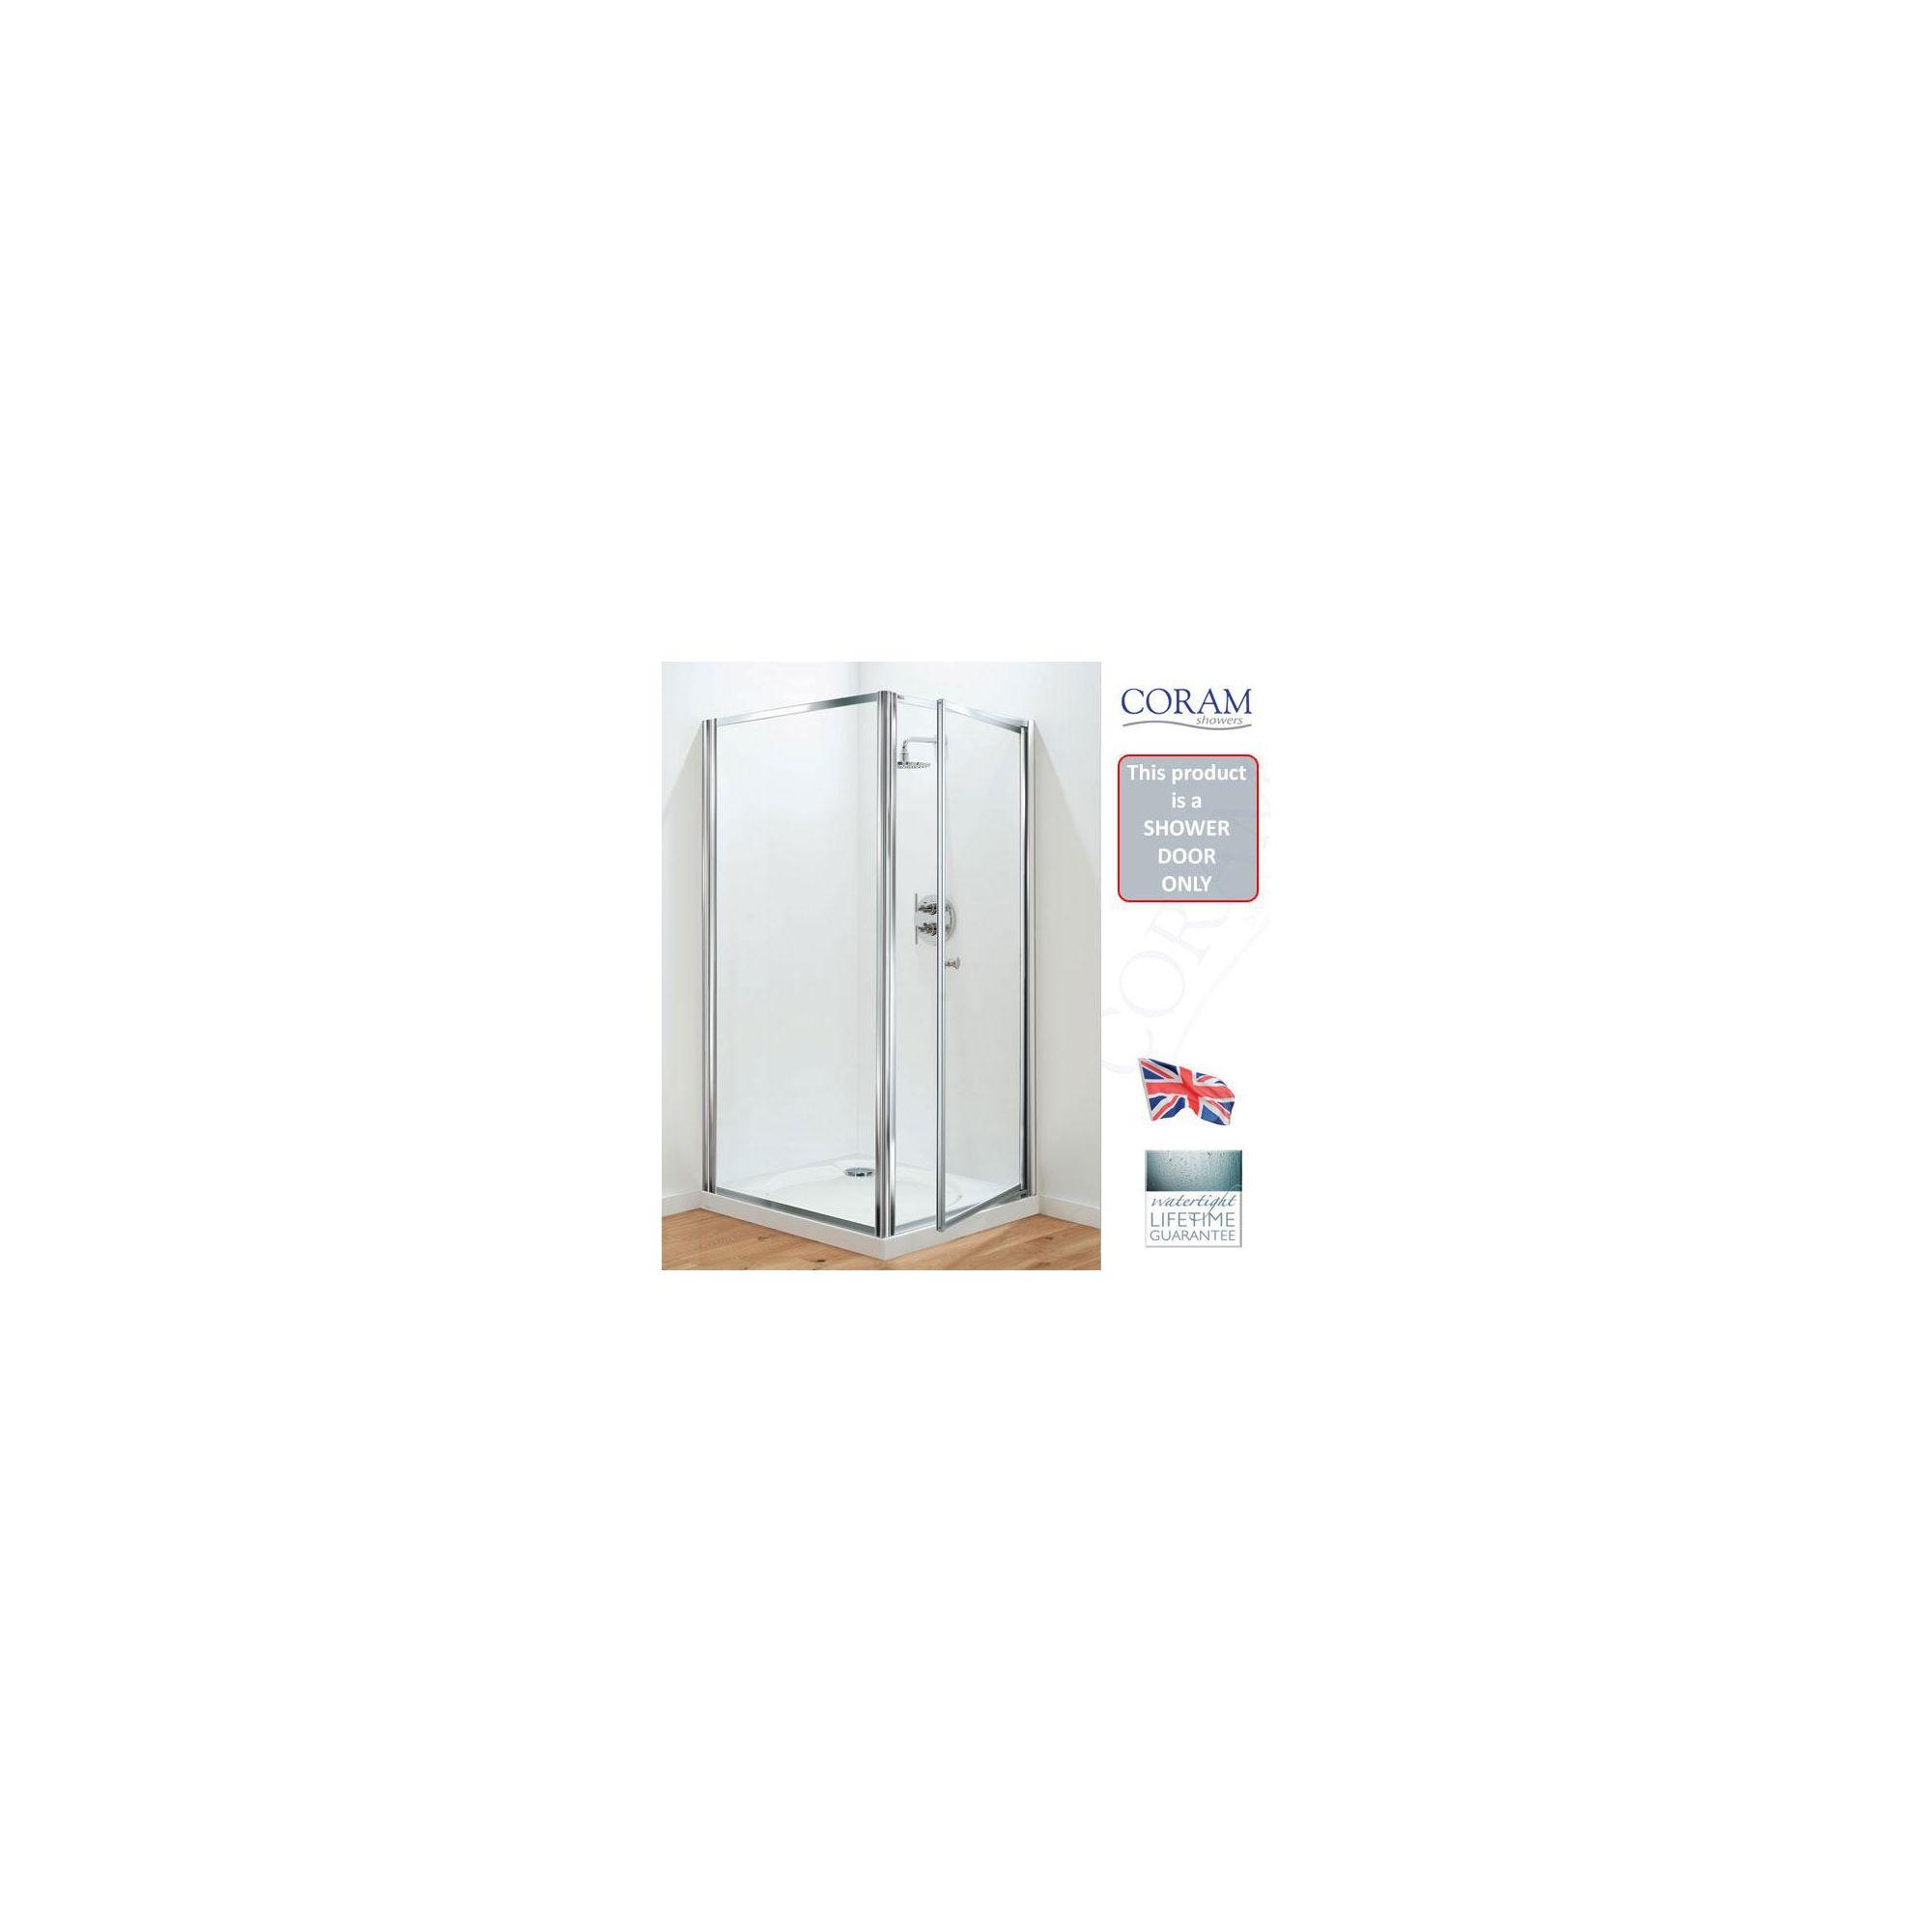 Coram Optima Pivot Shower Door, 900mm Wide, Chrome Frame, 6mm Plain Glass at Tesco Direct